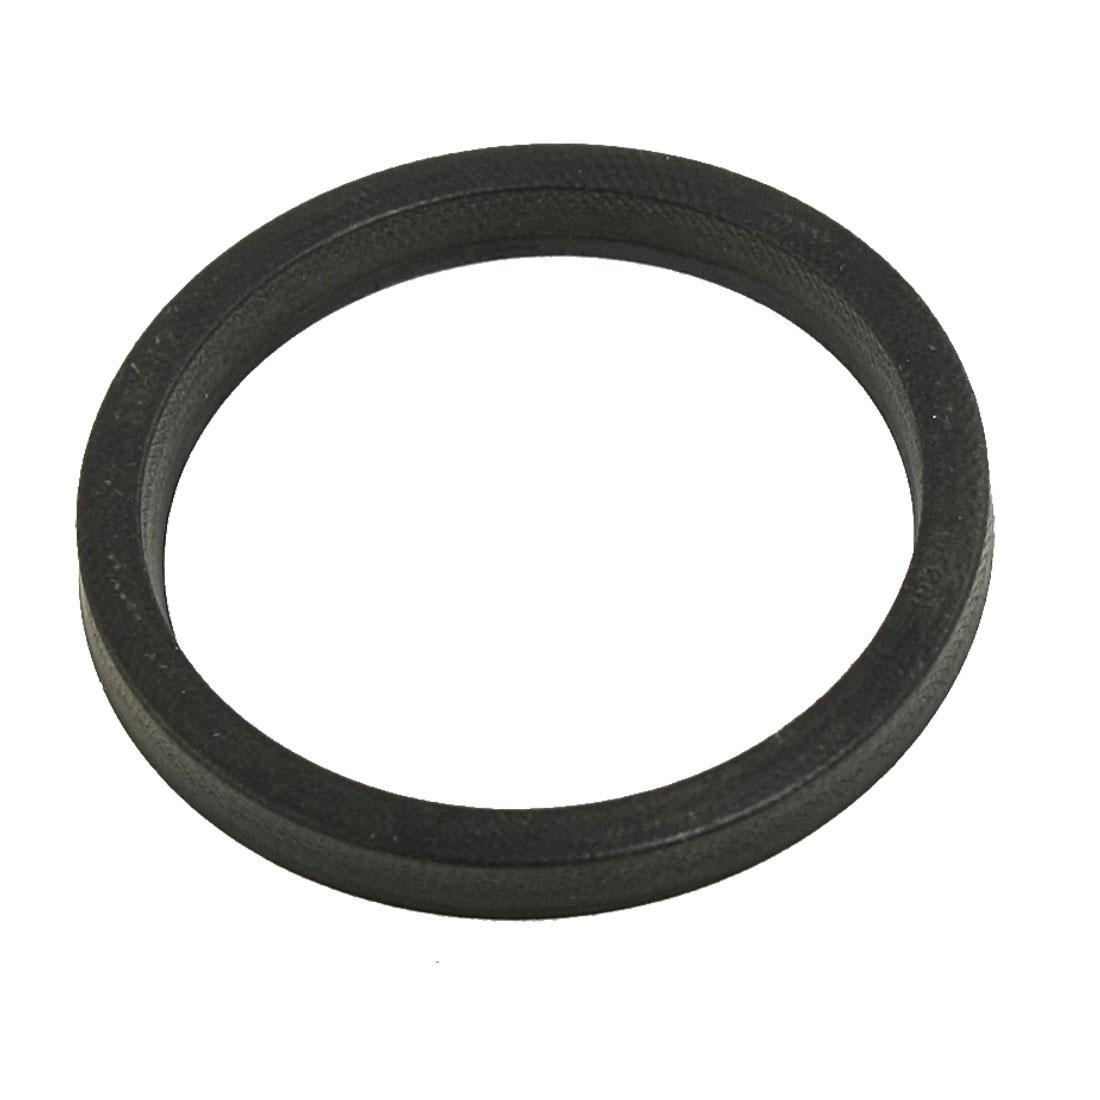 Cylinder Piston Rod Black NBR 42mm x 50mm x 6.4mm Oil Seal Gasket S8